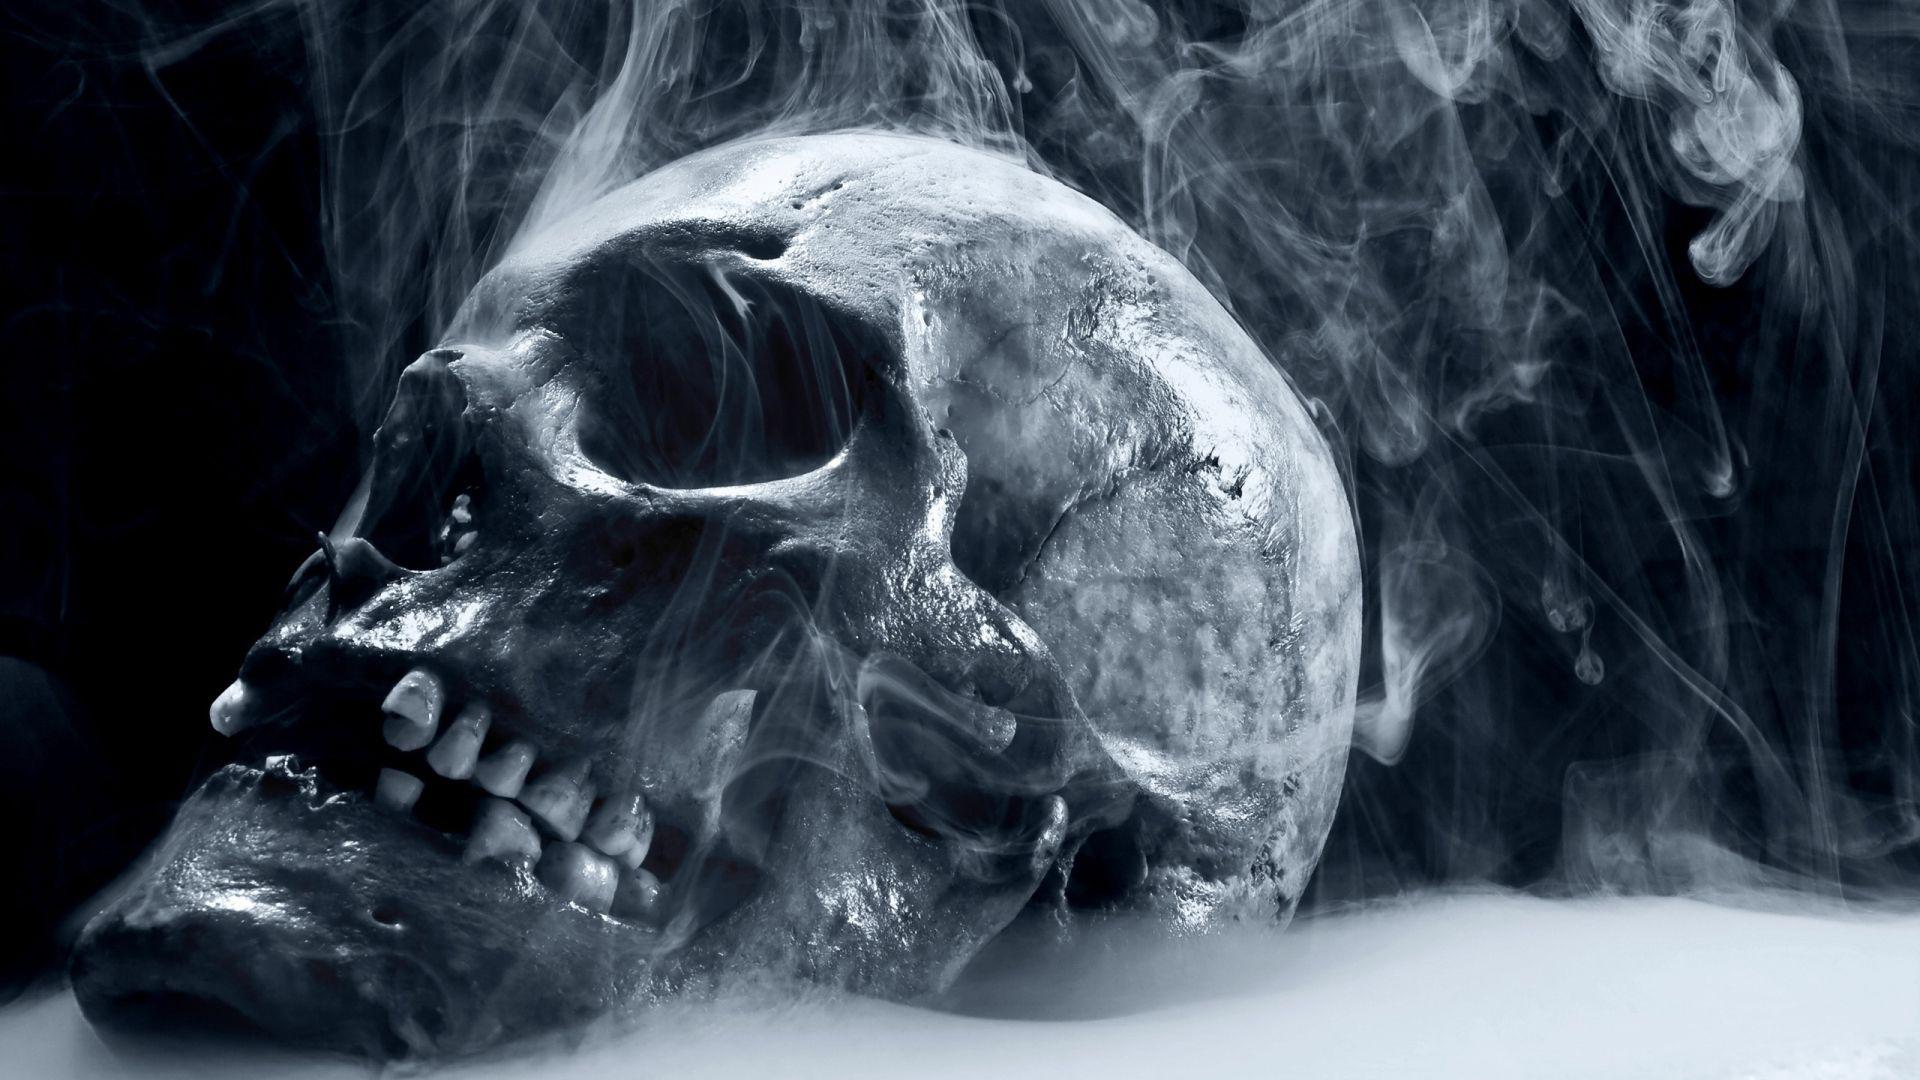 картинки черепа на рабочий стол